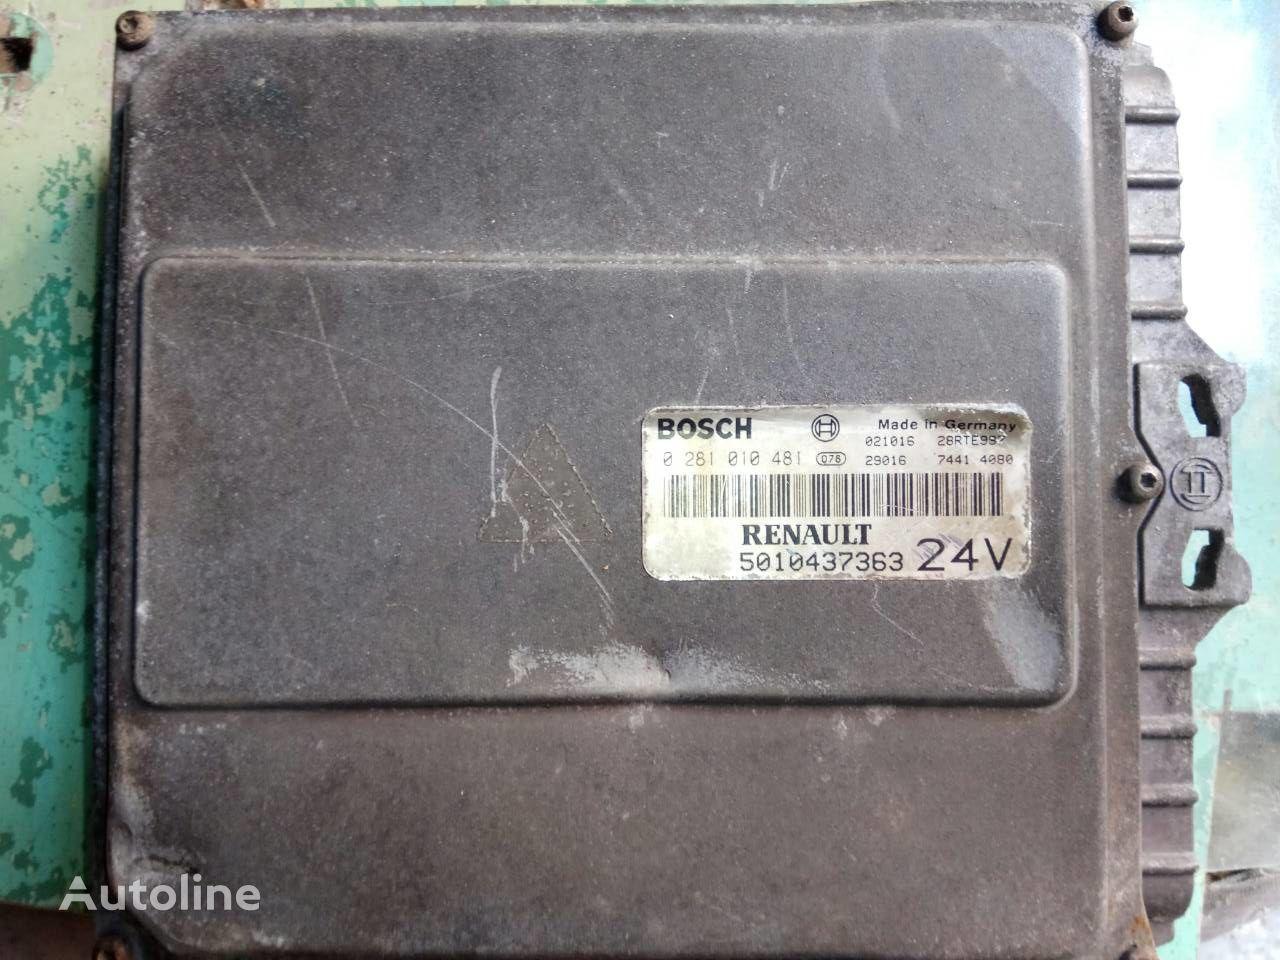 jednostka sterująca BOSCH 0281010481 do ciężarówki RENAULT Magnum E-TECH 440